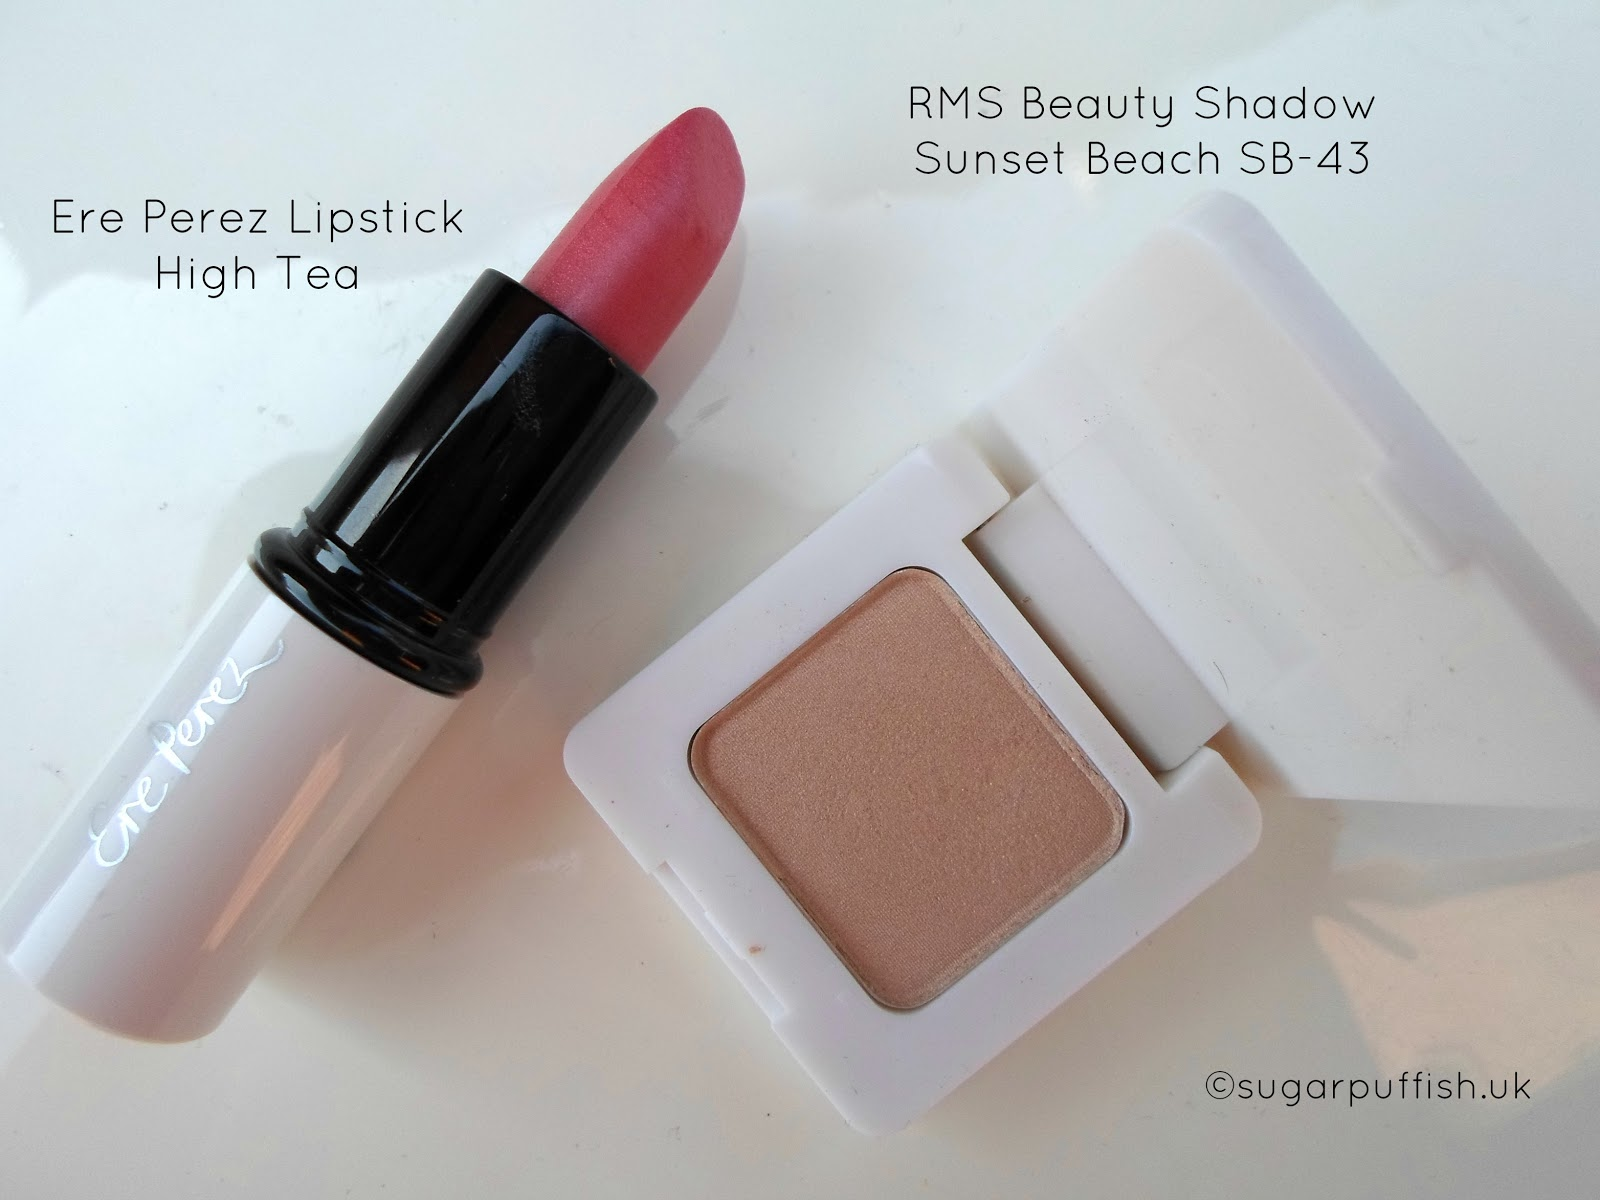 Ere Perez Rich Olive Oil Lipstick High Tea RMS Beauty Swift Shadow Sunset Beach SB43